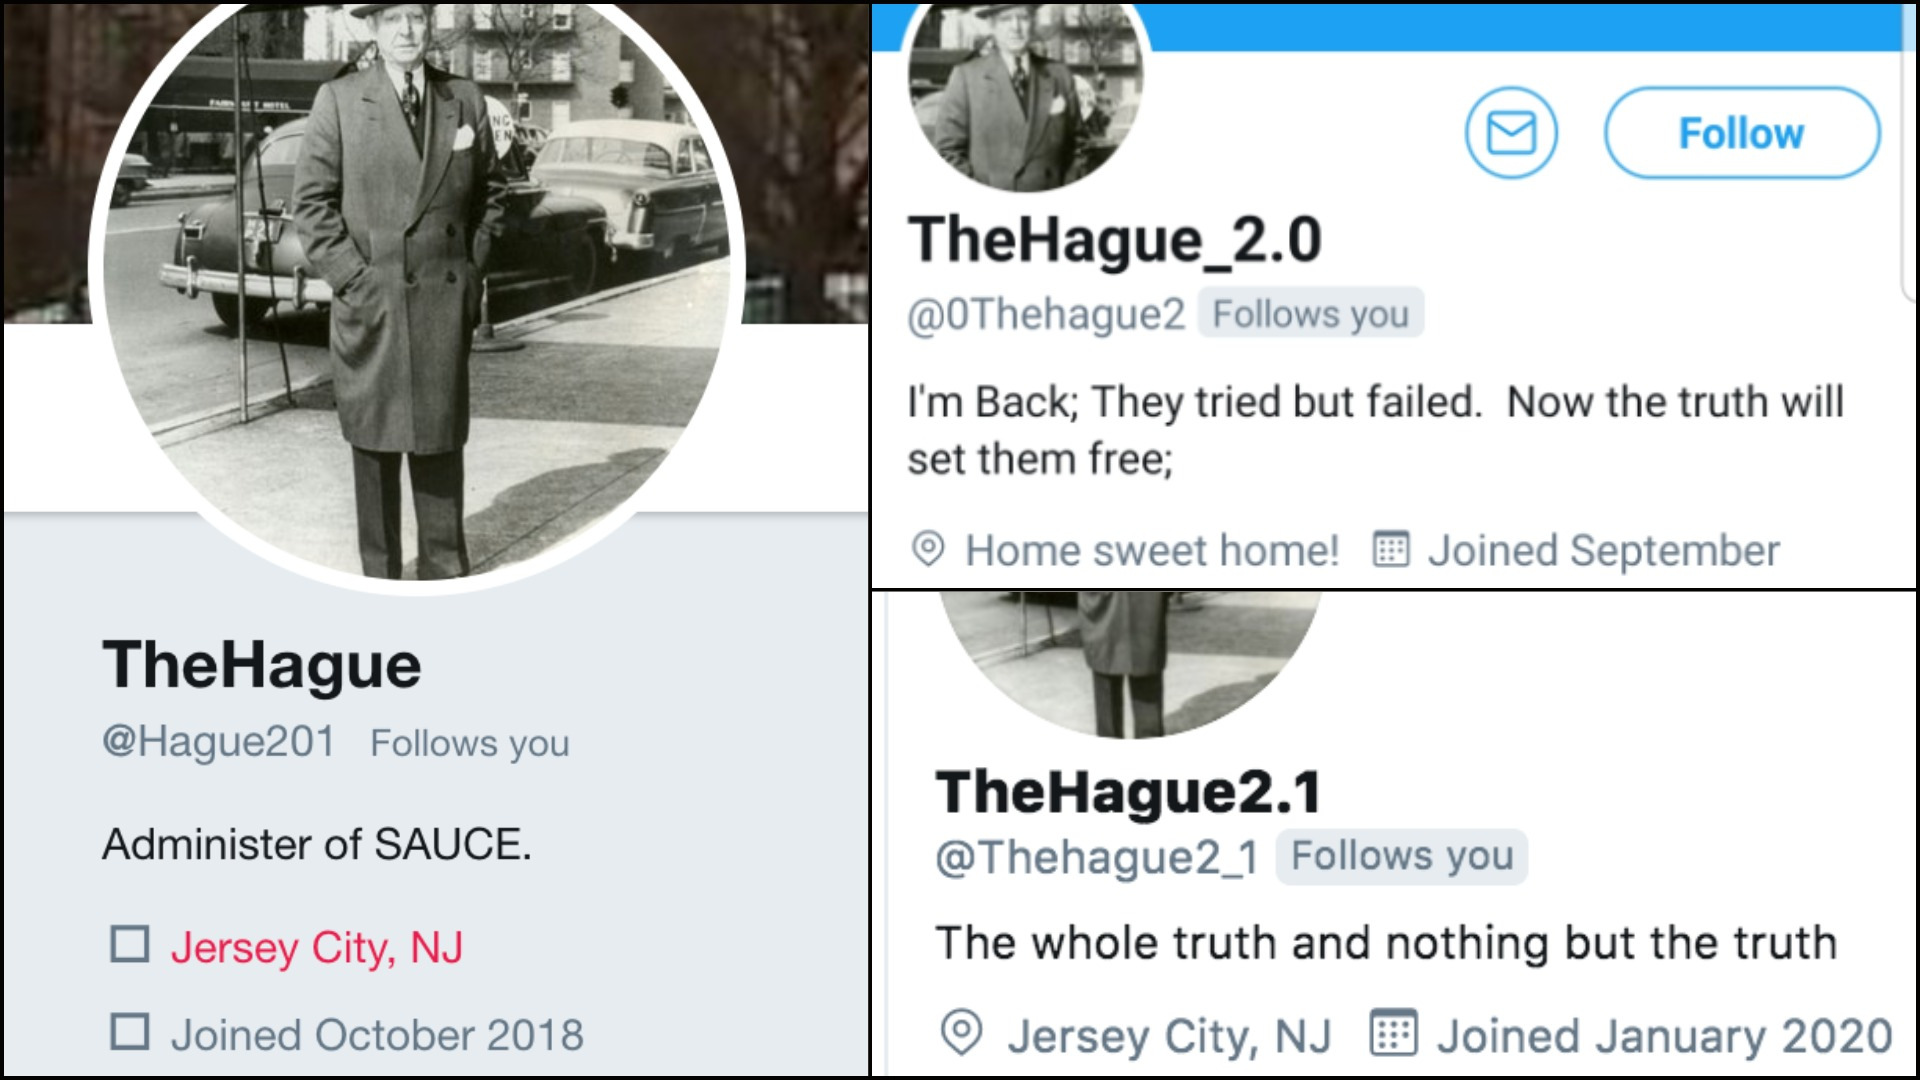 The Hague - Jersey City Twitter